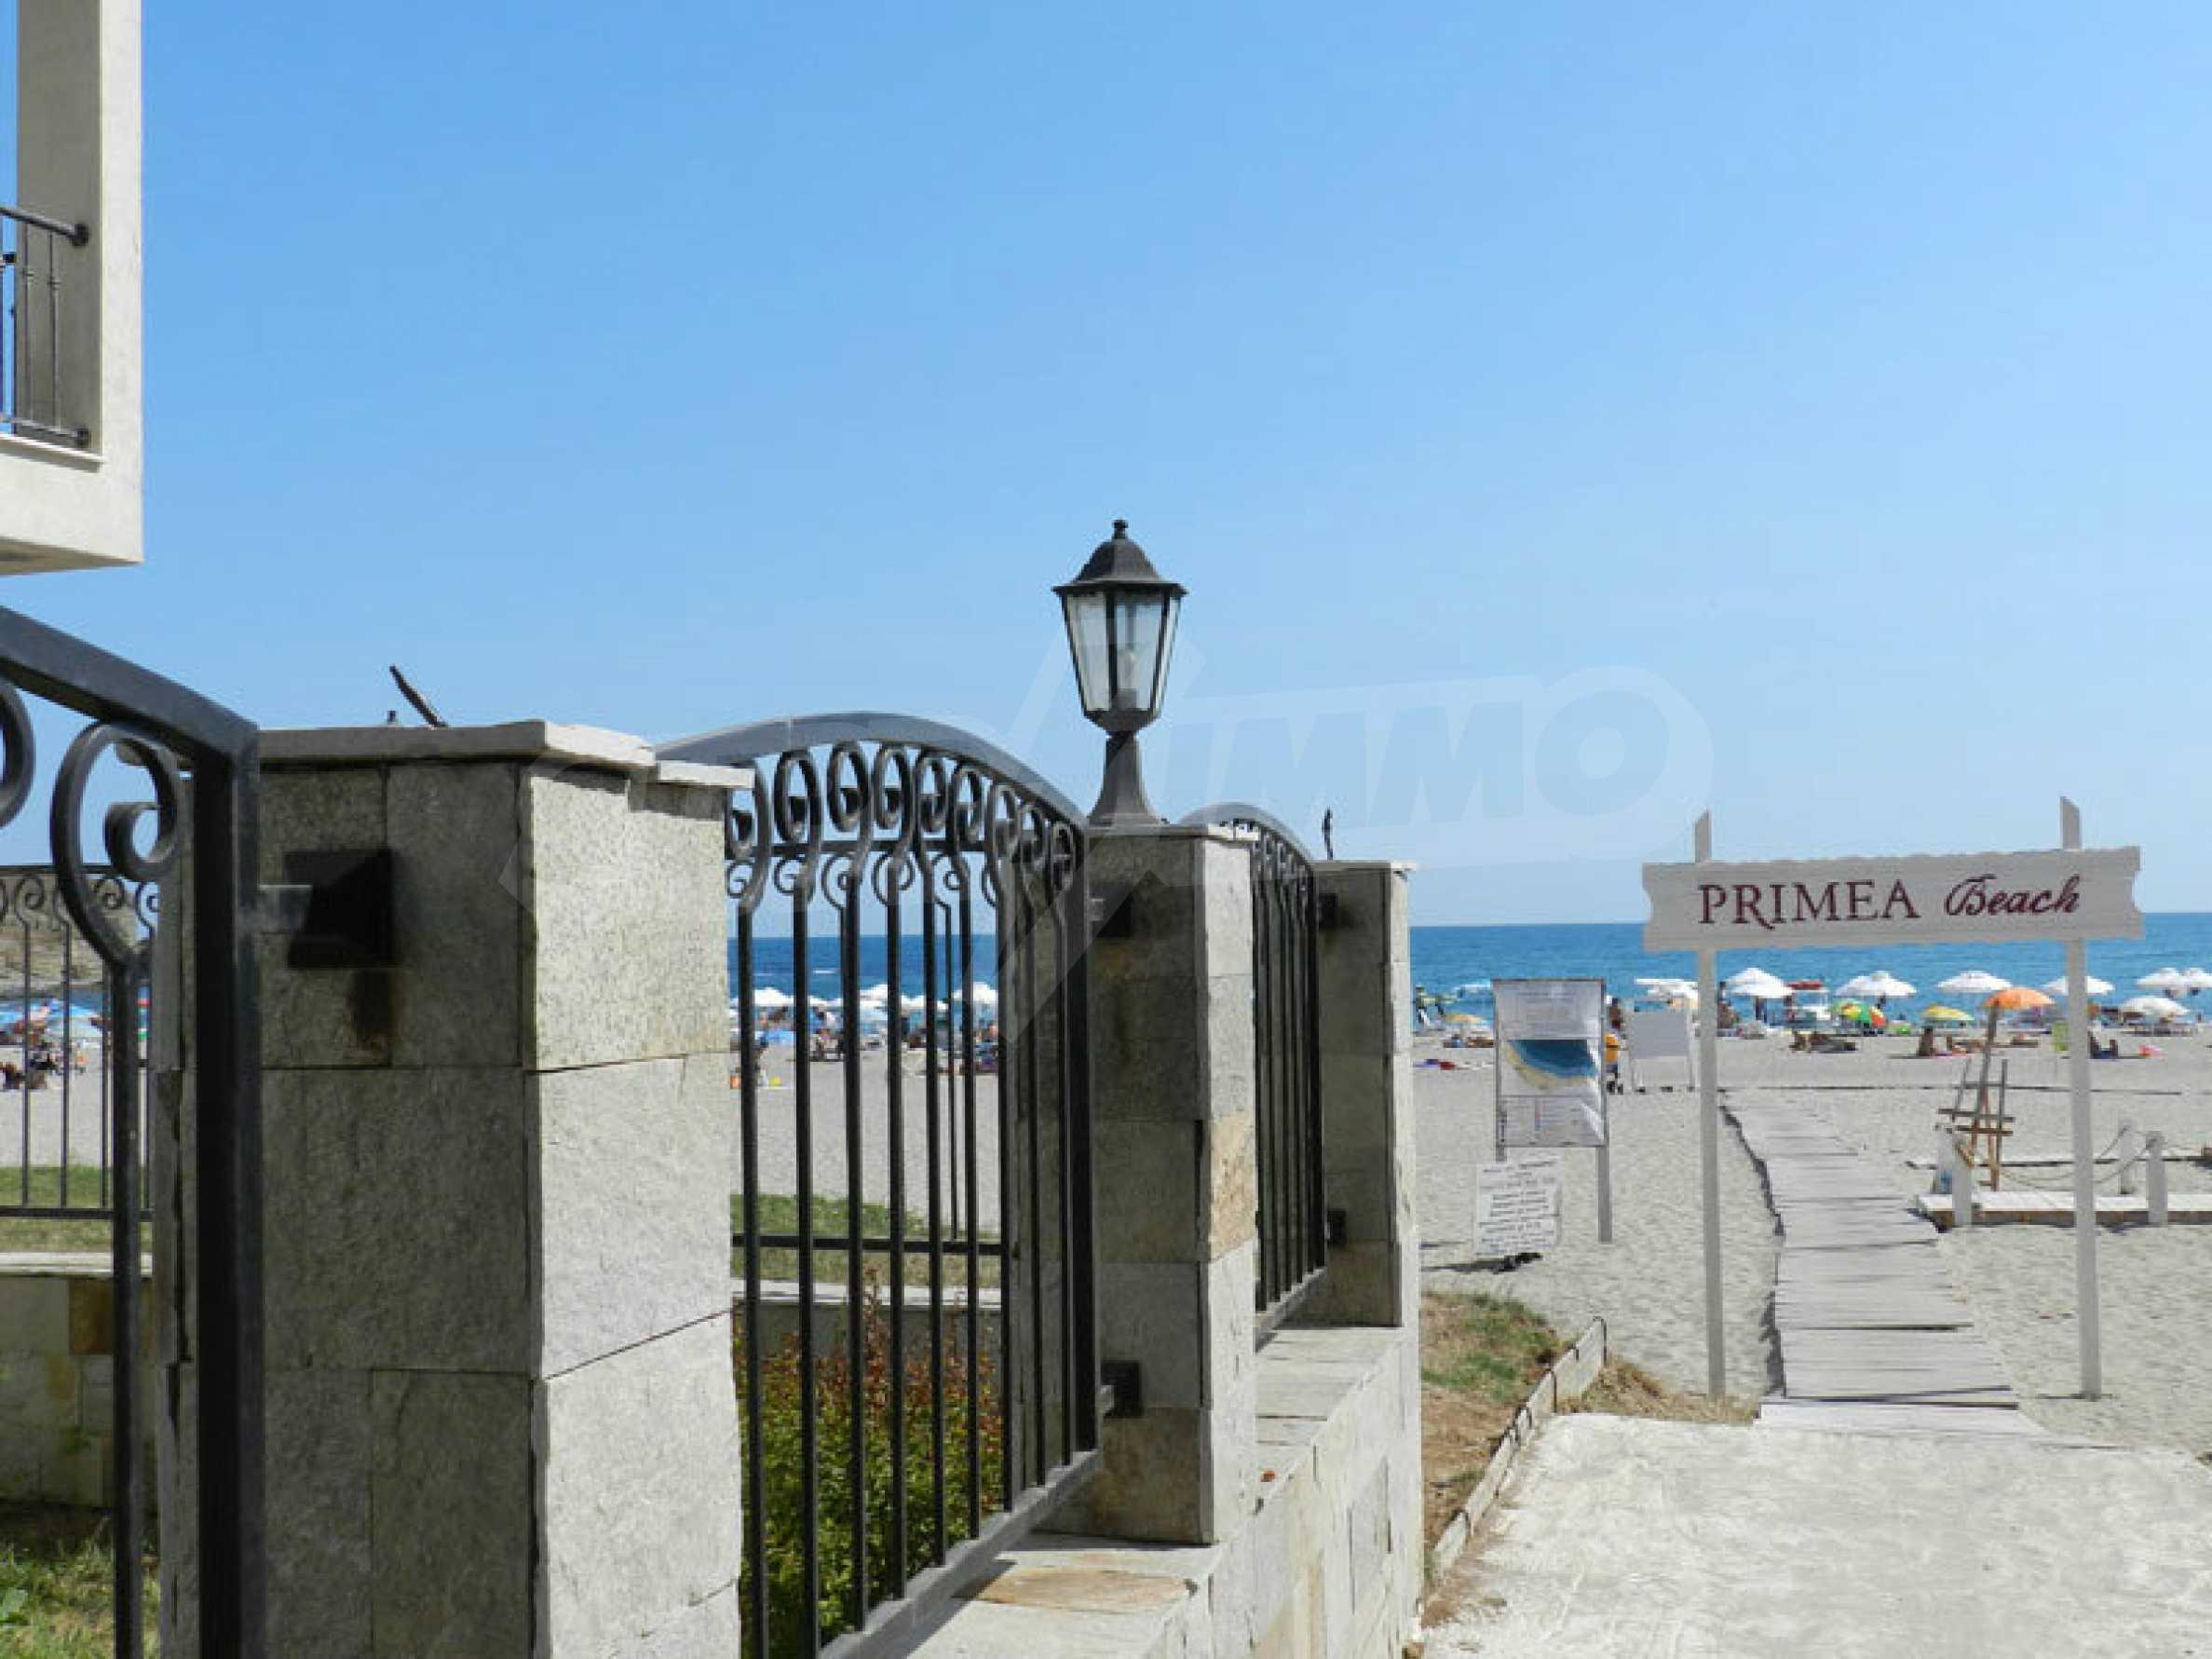 Примеа Бийч Резиденс / Primea Beach Residence 21